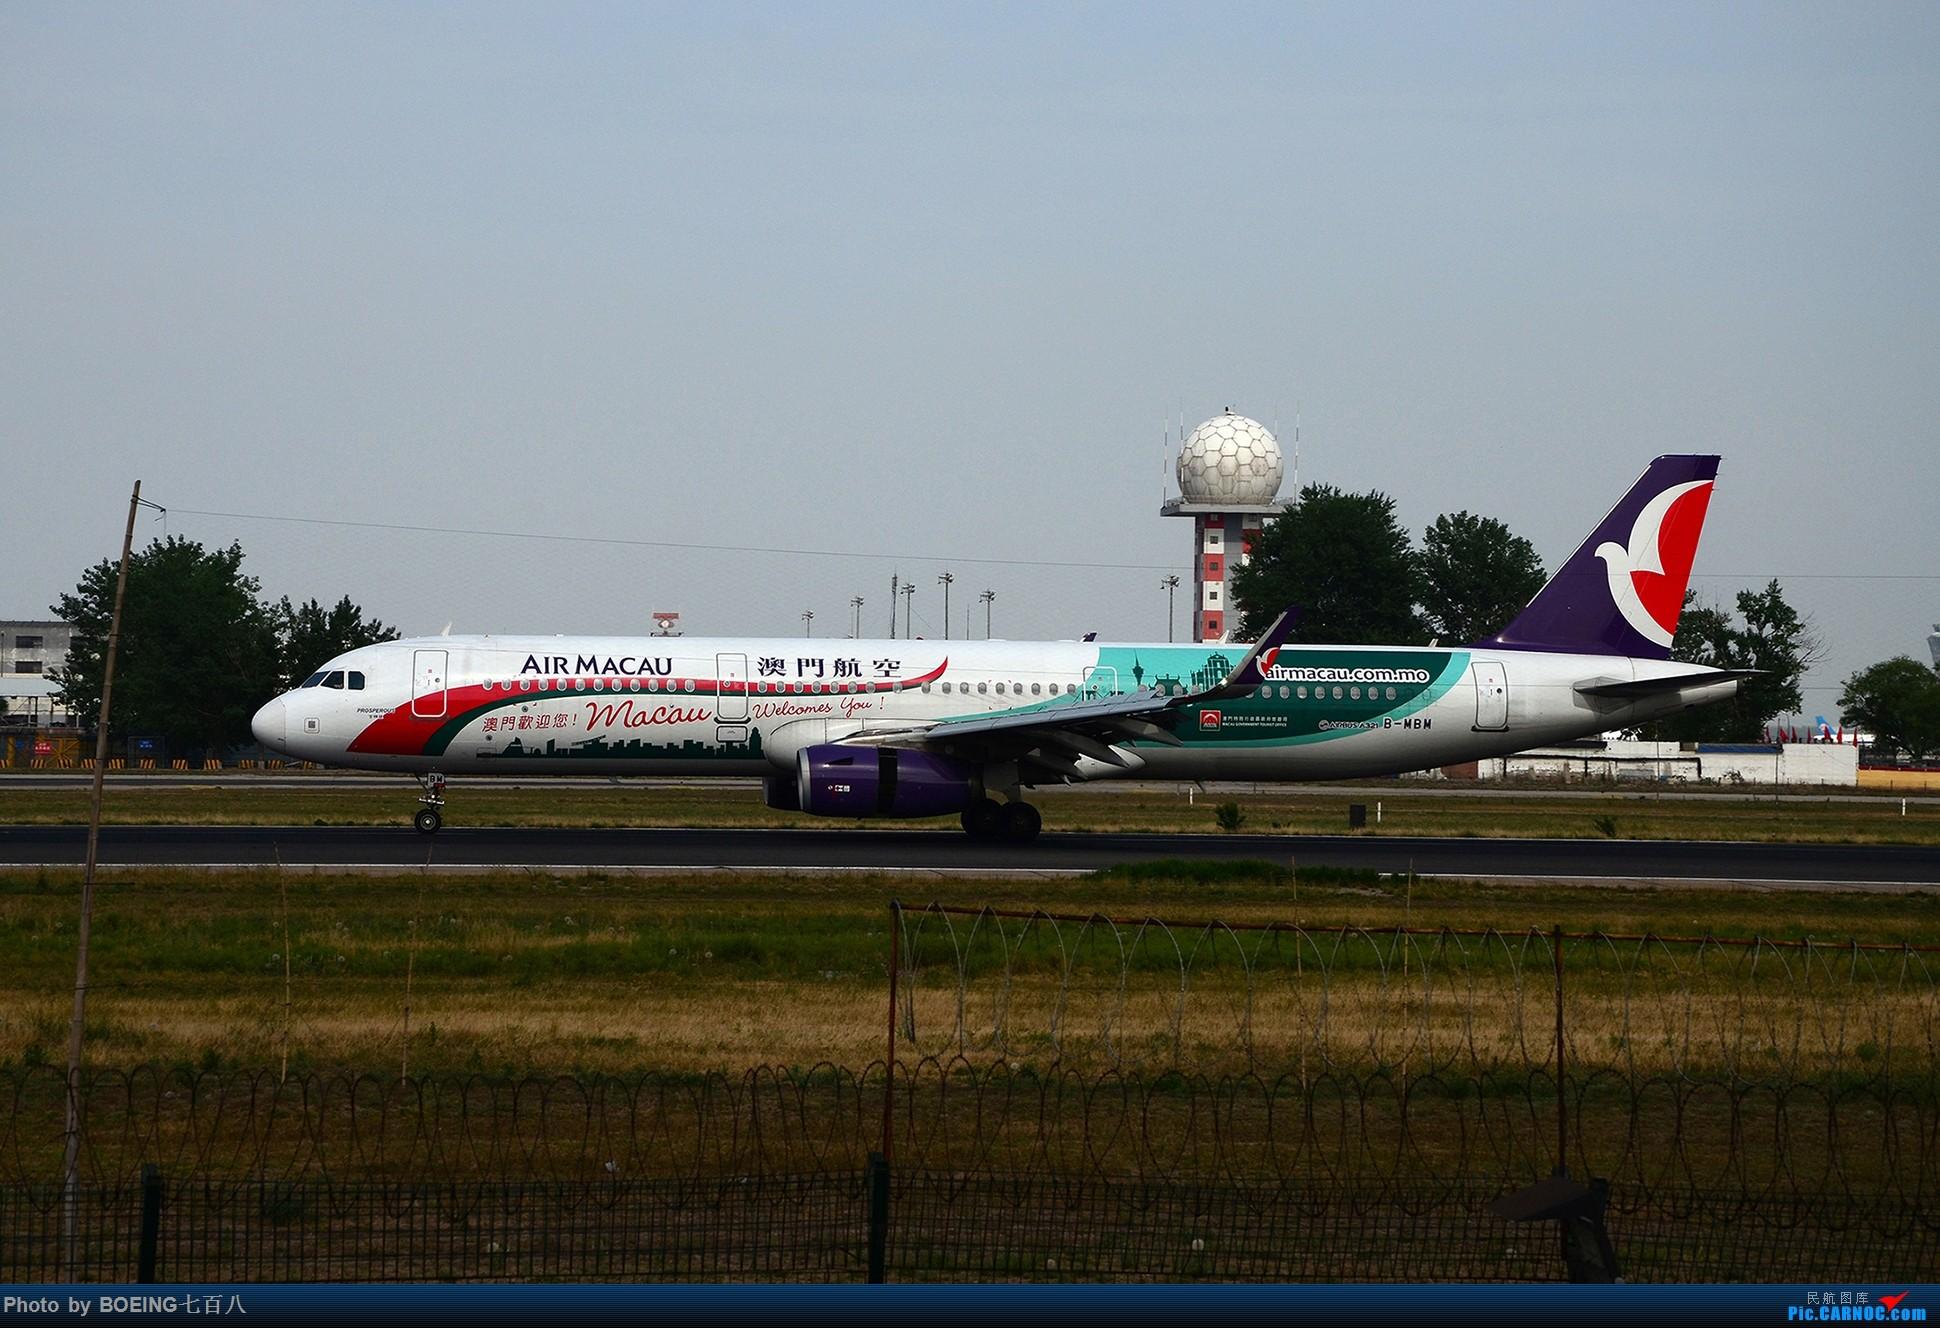 Re:[原创]海航家的黄焖熊猫和清蒸熊猫等好货 AIRBUS A321-200 B-MBM 中国北京首都国际机场